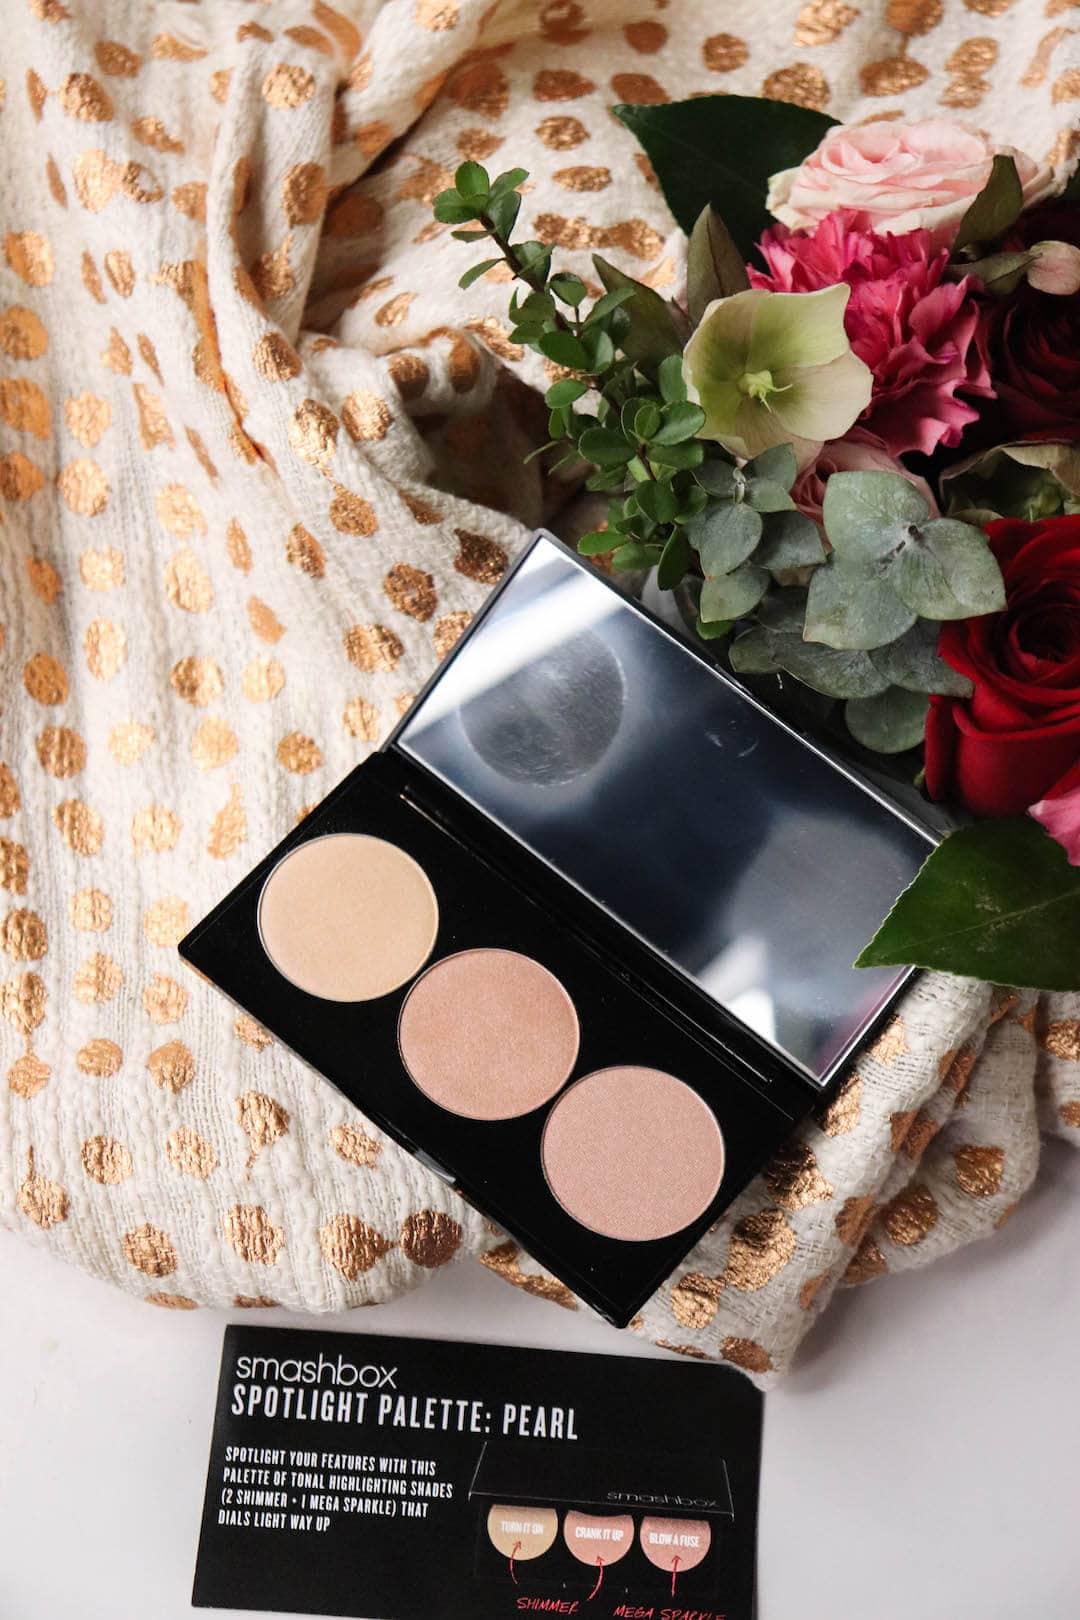 Beauty Bridge Haul | Stila Cosmetics & Smashbox Cosmetics Review